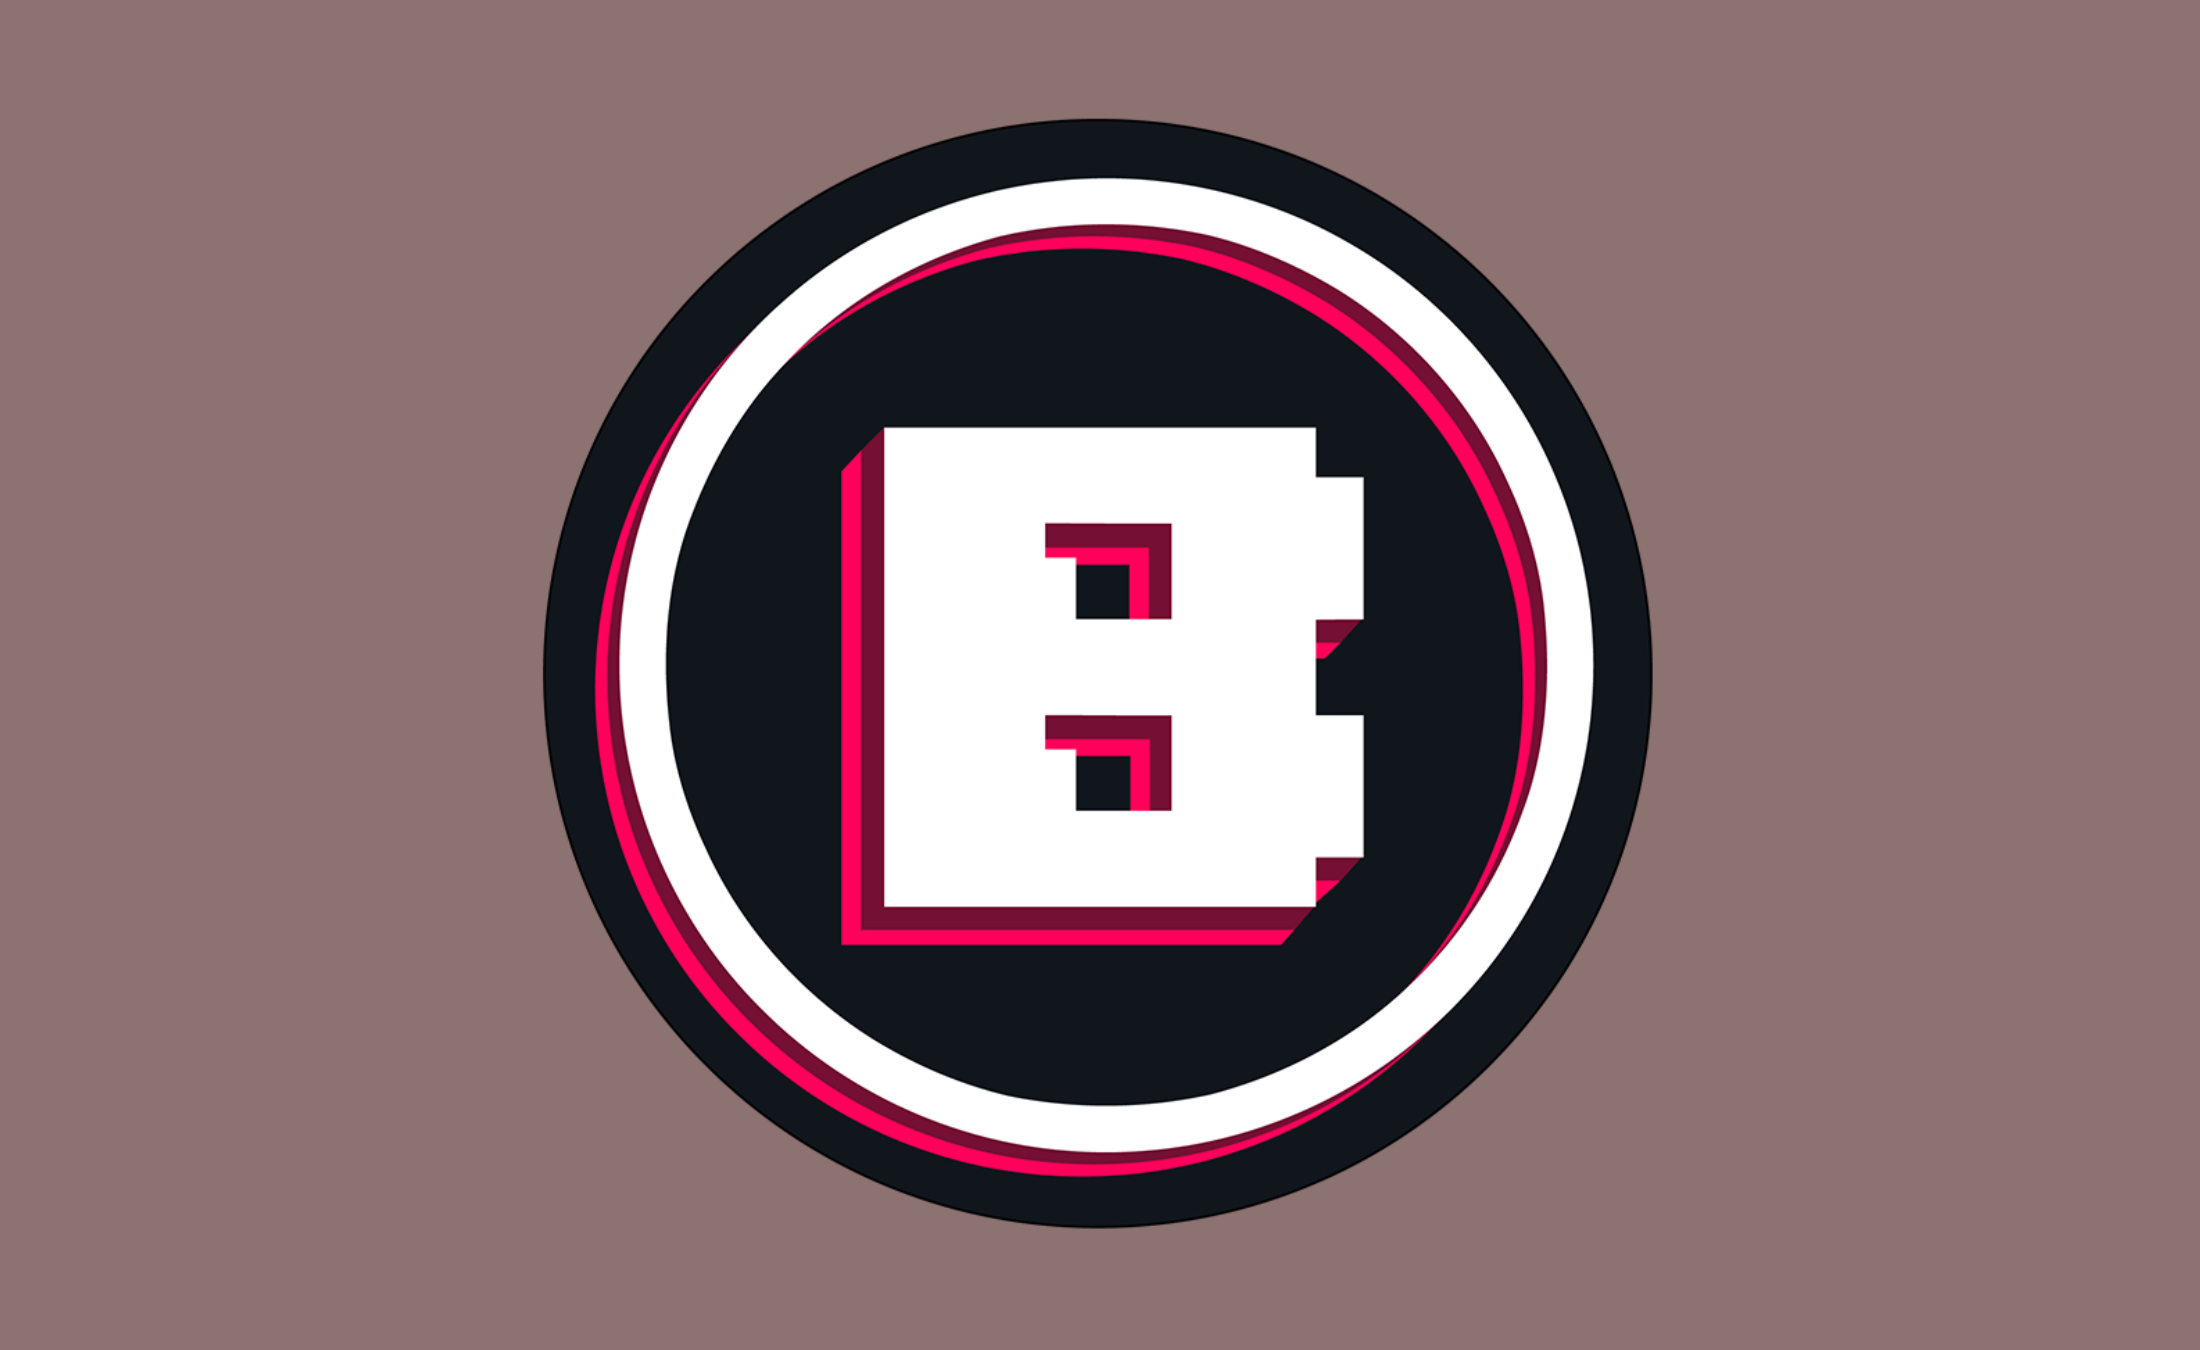 como-instalar-o-bytz-uma-moeda-digital-no-ubuntu-linux-mint-fedora-debian